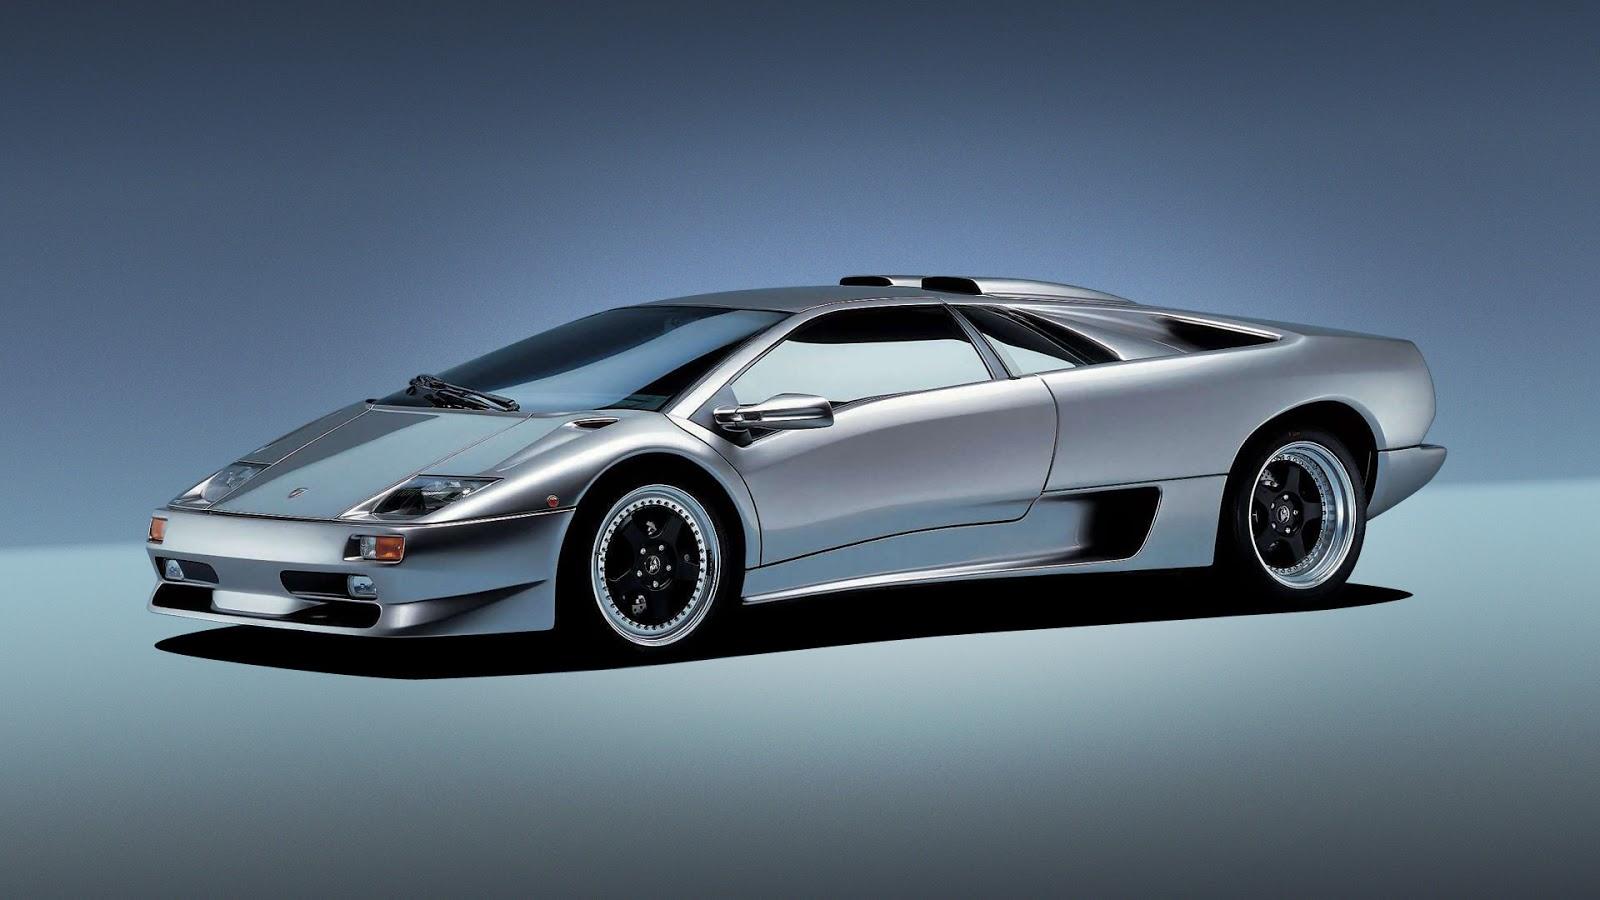 Luxury Lamborghini Cars: Lamborghini Diablo Sv